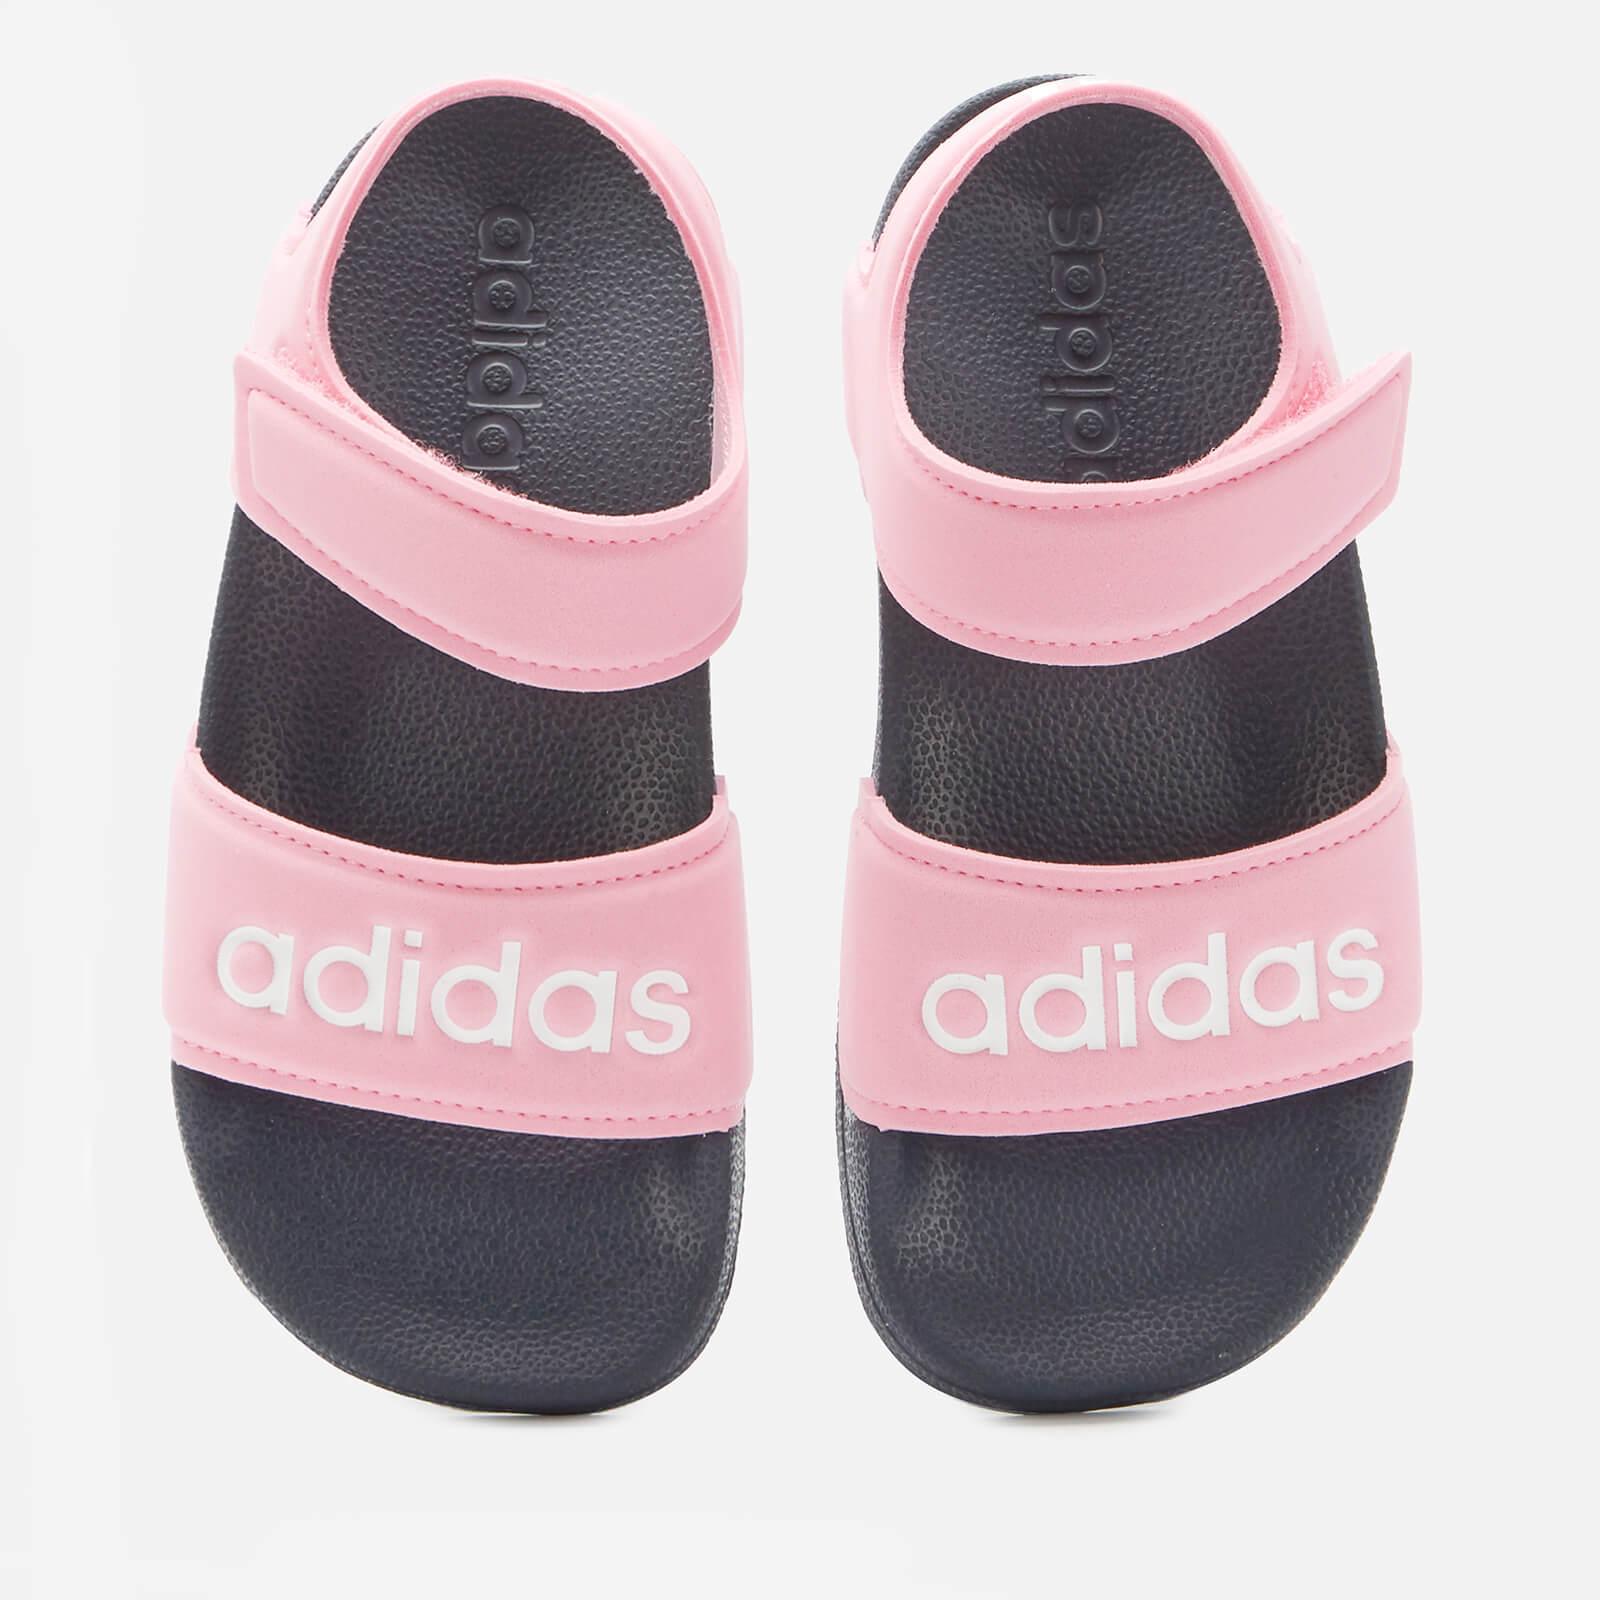 adidas Girls Adilette Sandals - True